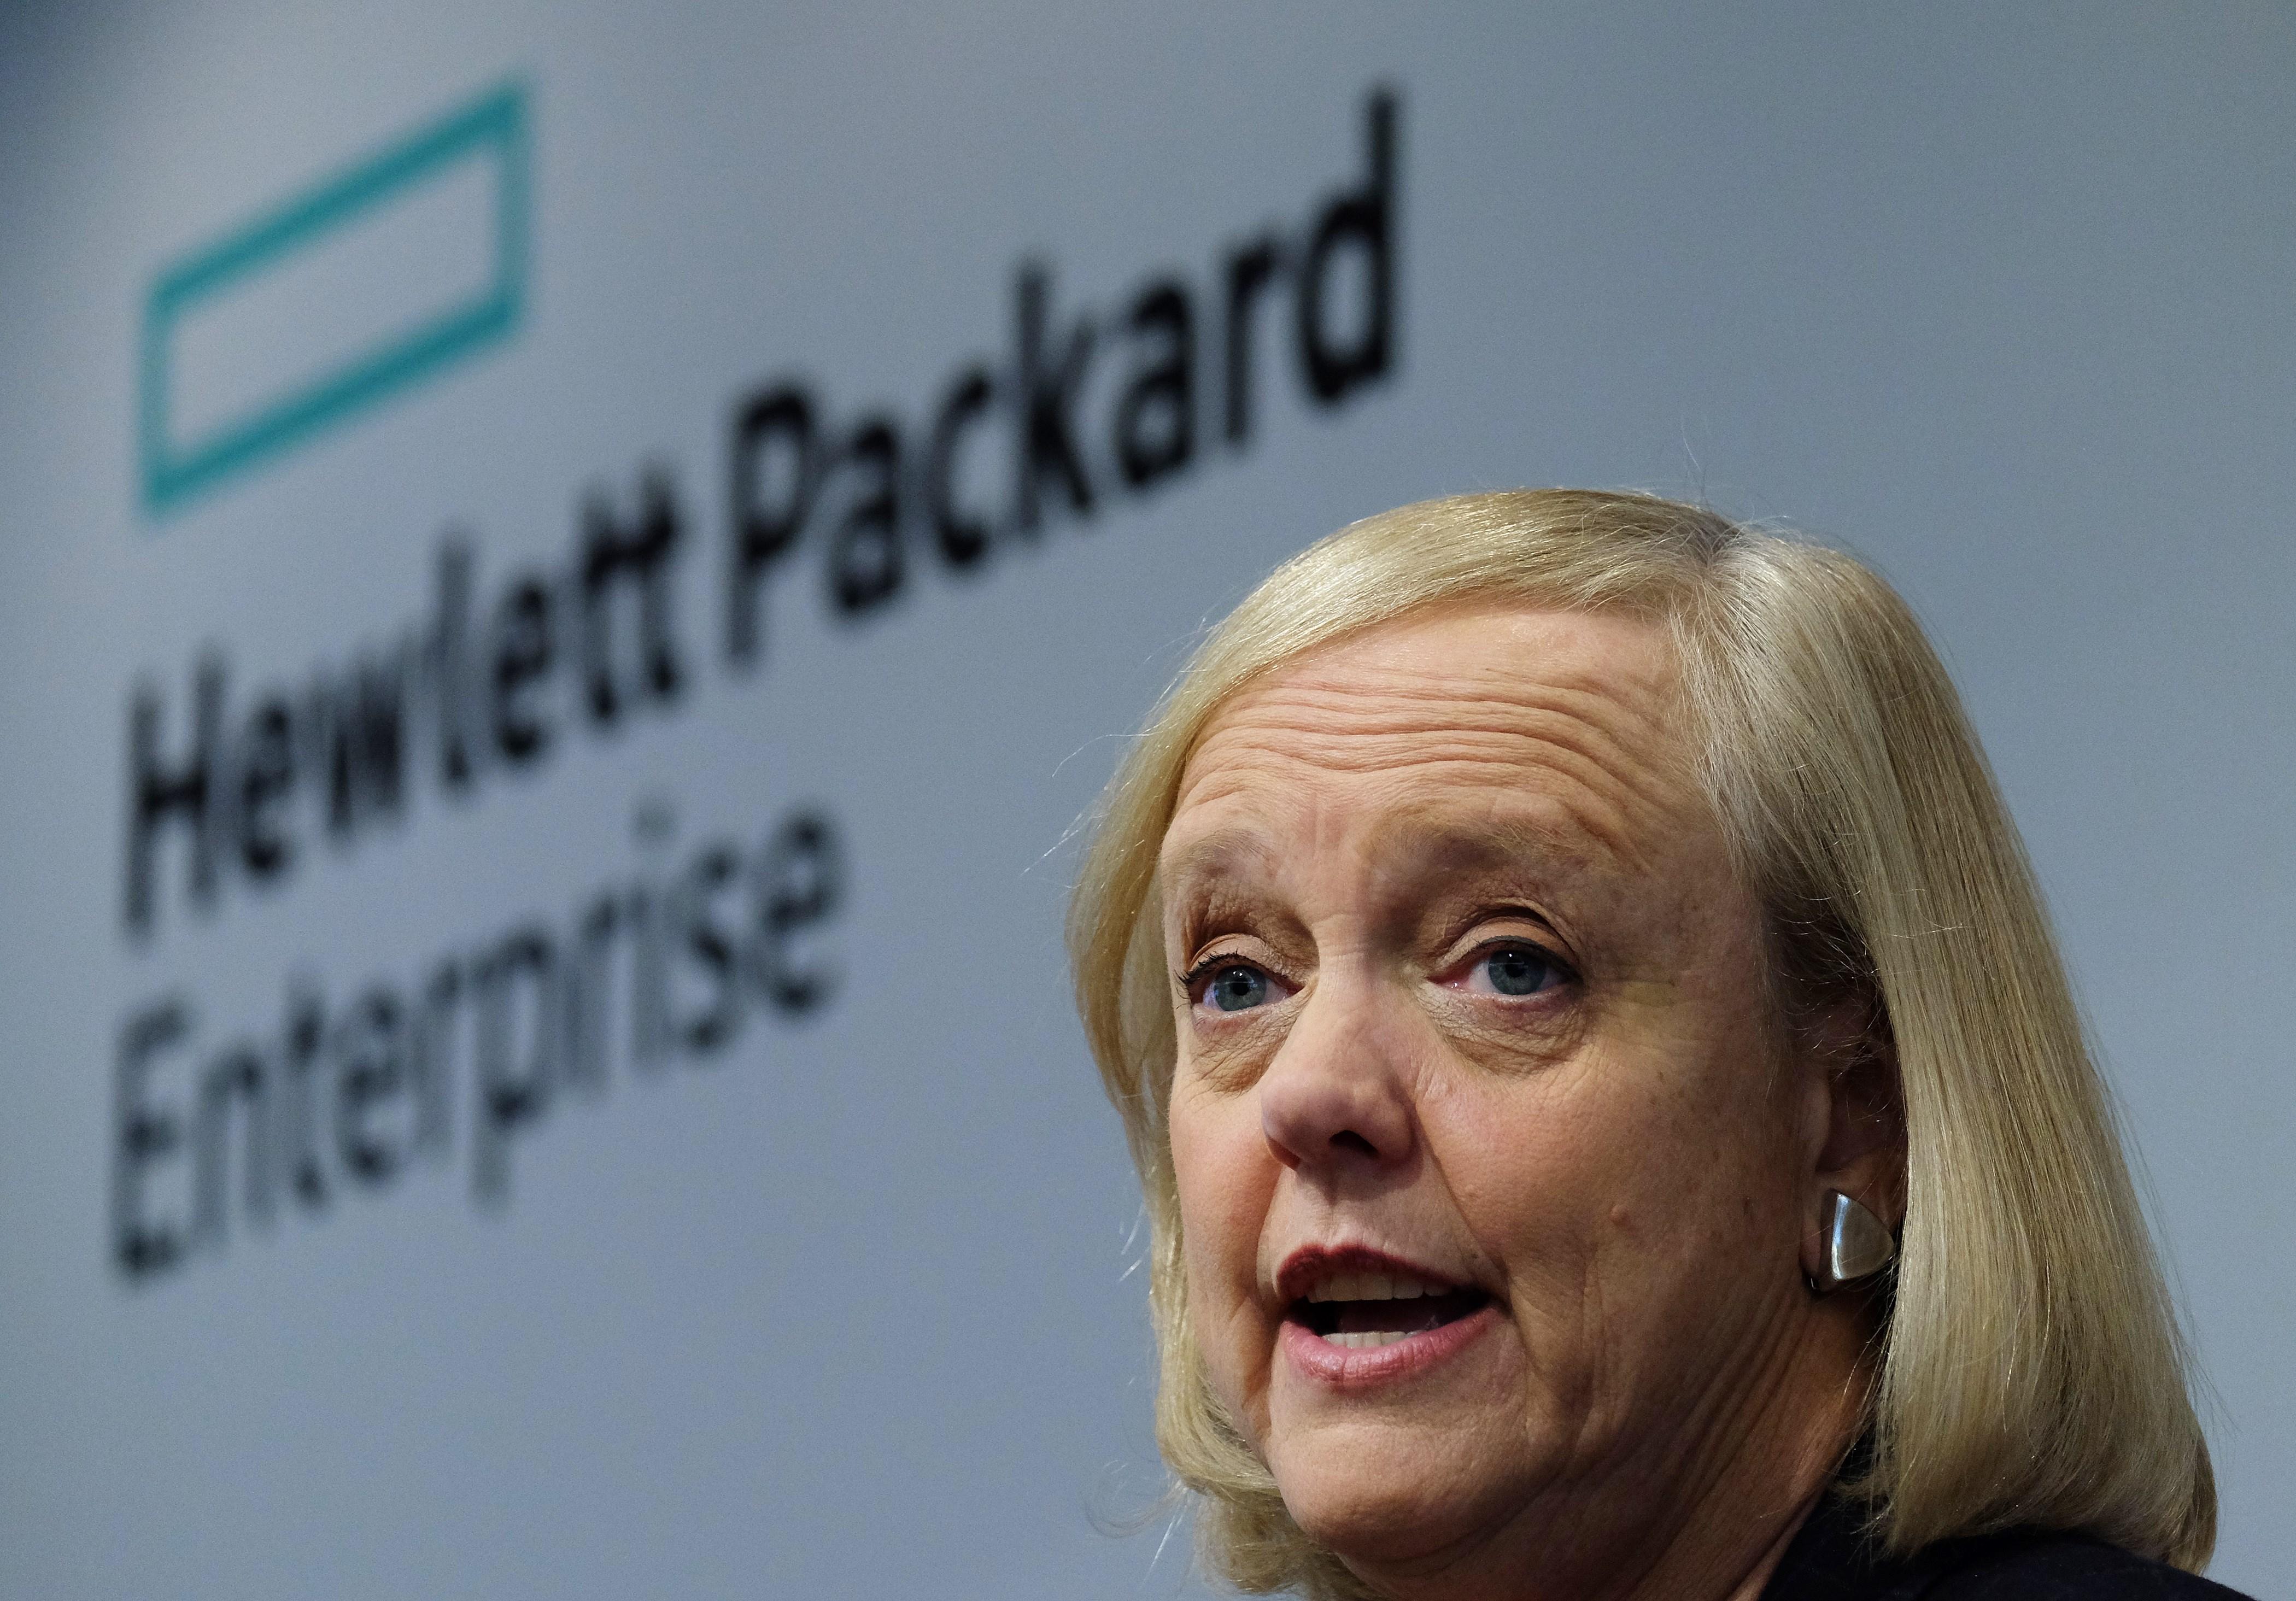 Hewlett Packard Enterprise to spin off software assets in $8 8B transaction